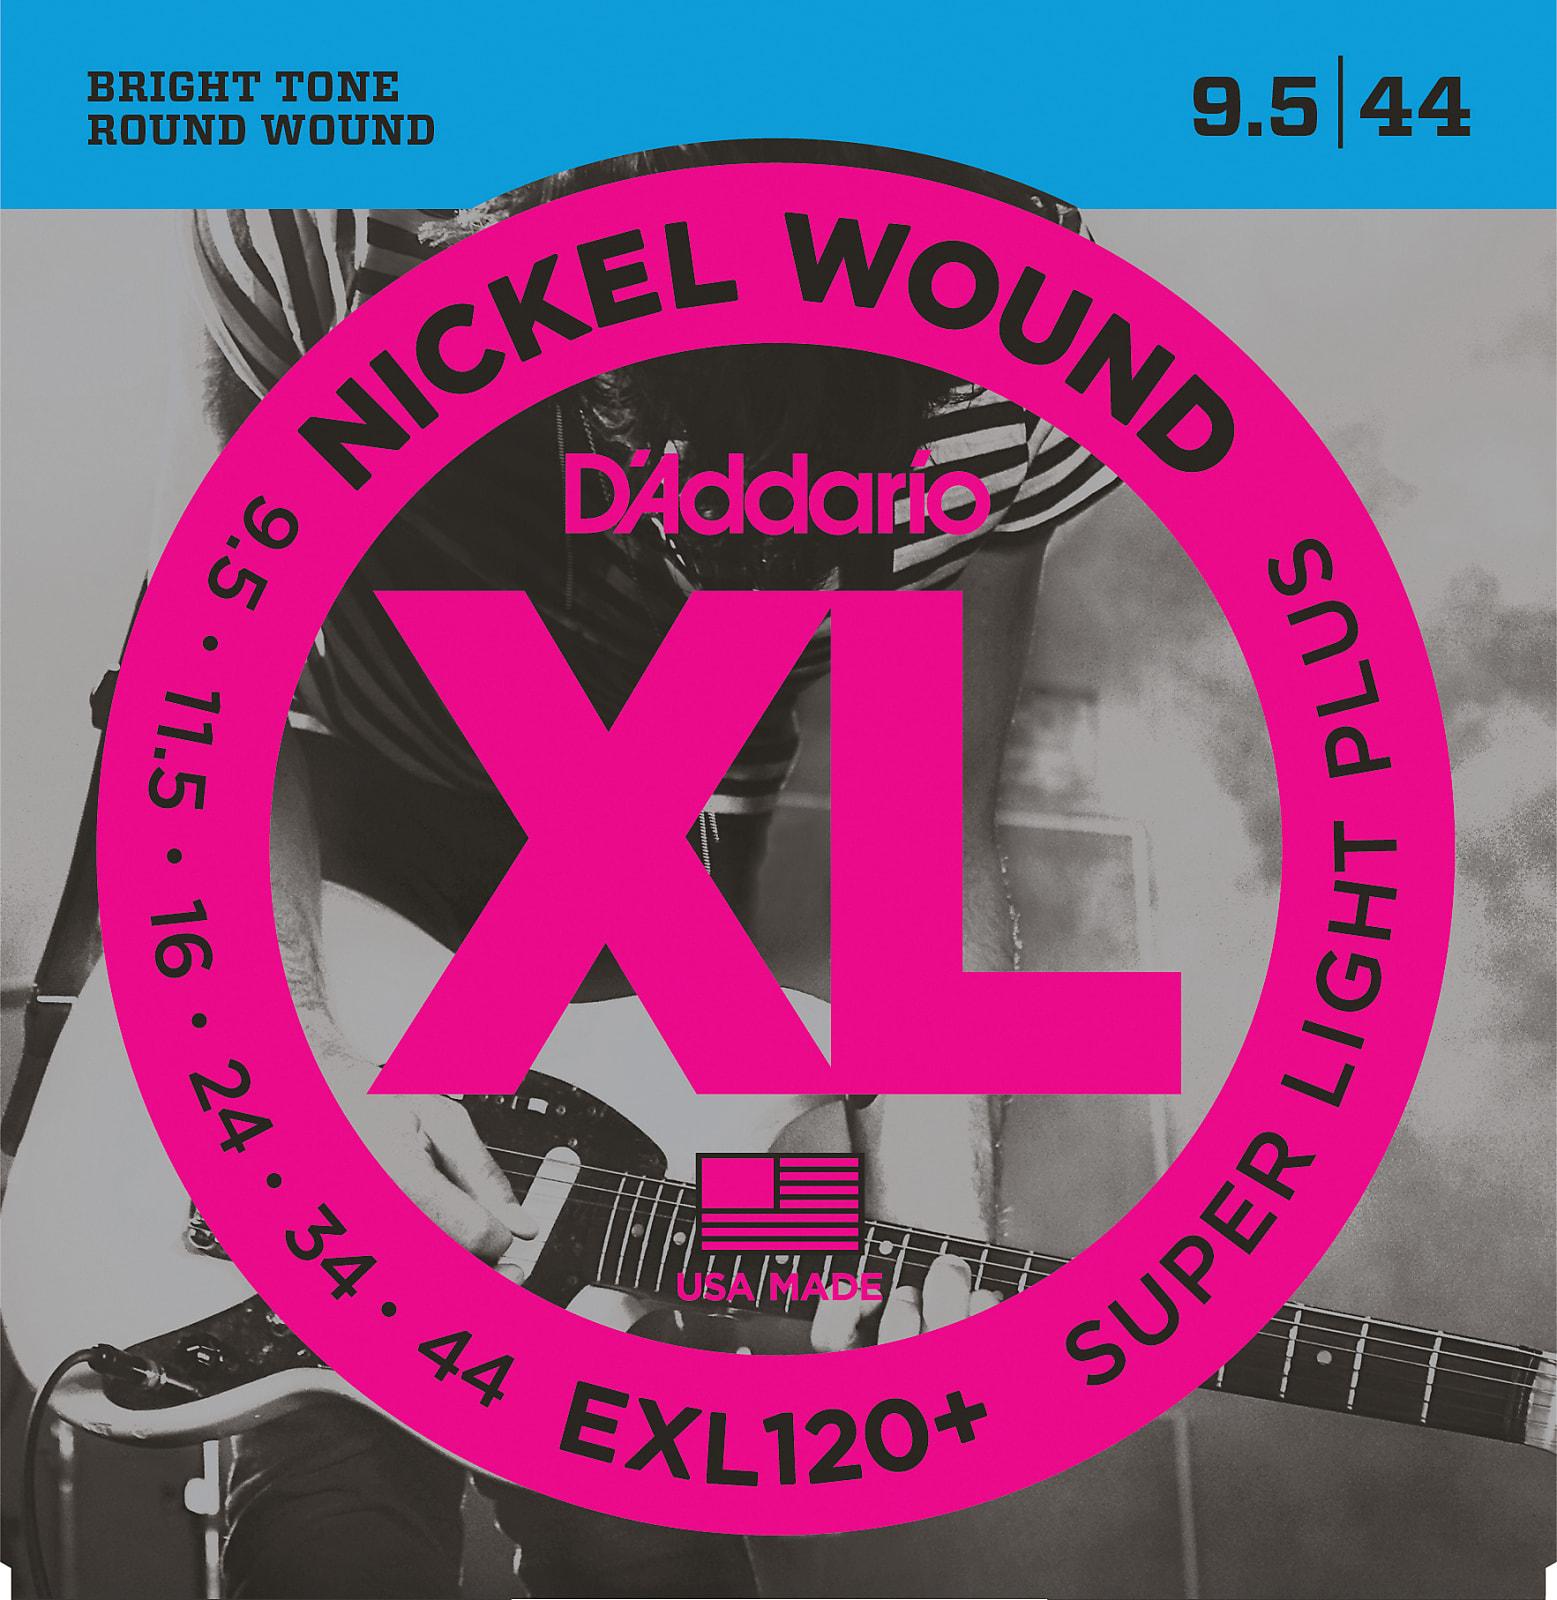 D'Addario EXL120+ Nickel Wound Electric Guitar Strings, Super Light Plus, 9.5-4